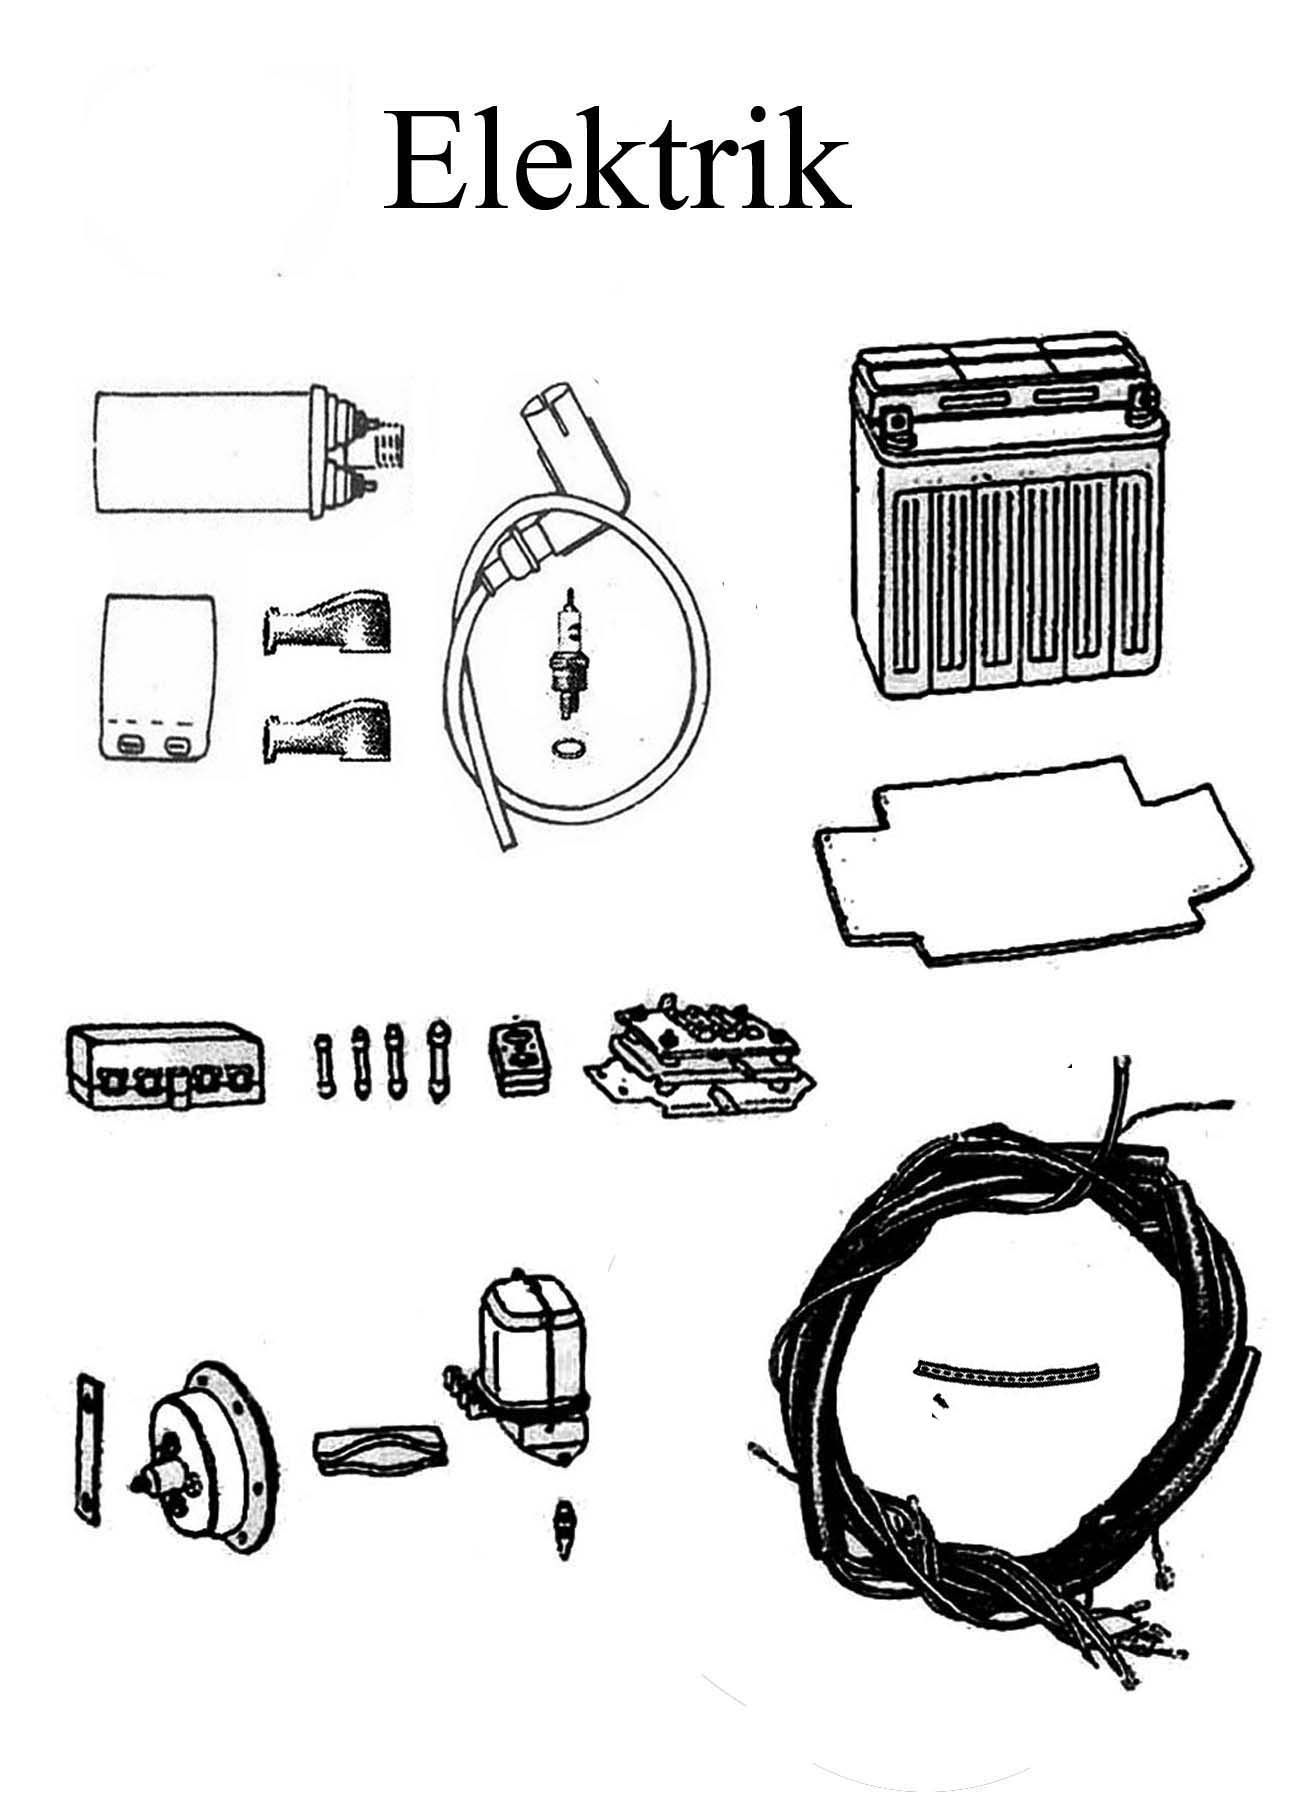 MZ ETZ 125-150 Ersatzteileliste Elektrik Batterie Regler Kabelbaum Zündspule